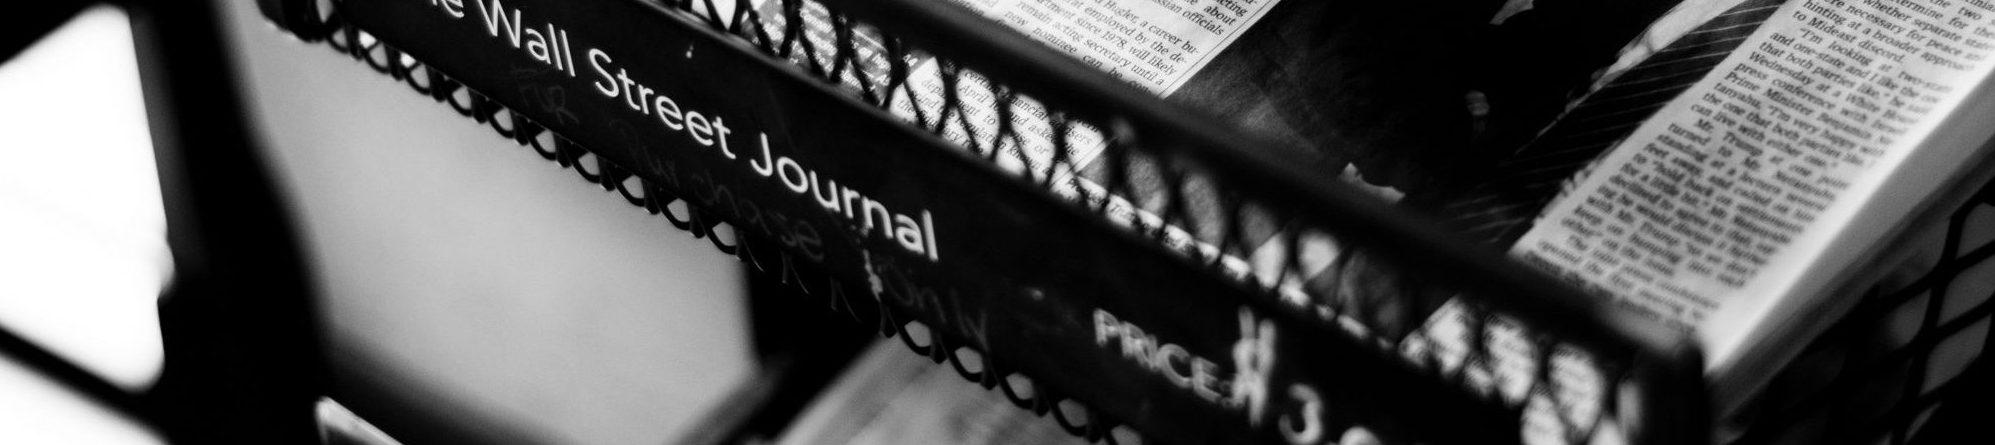 Newspapers on newstand